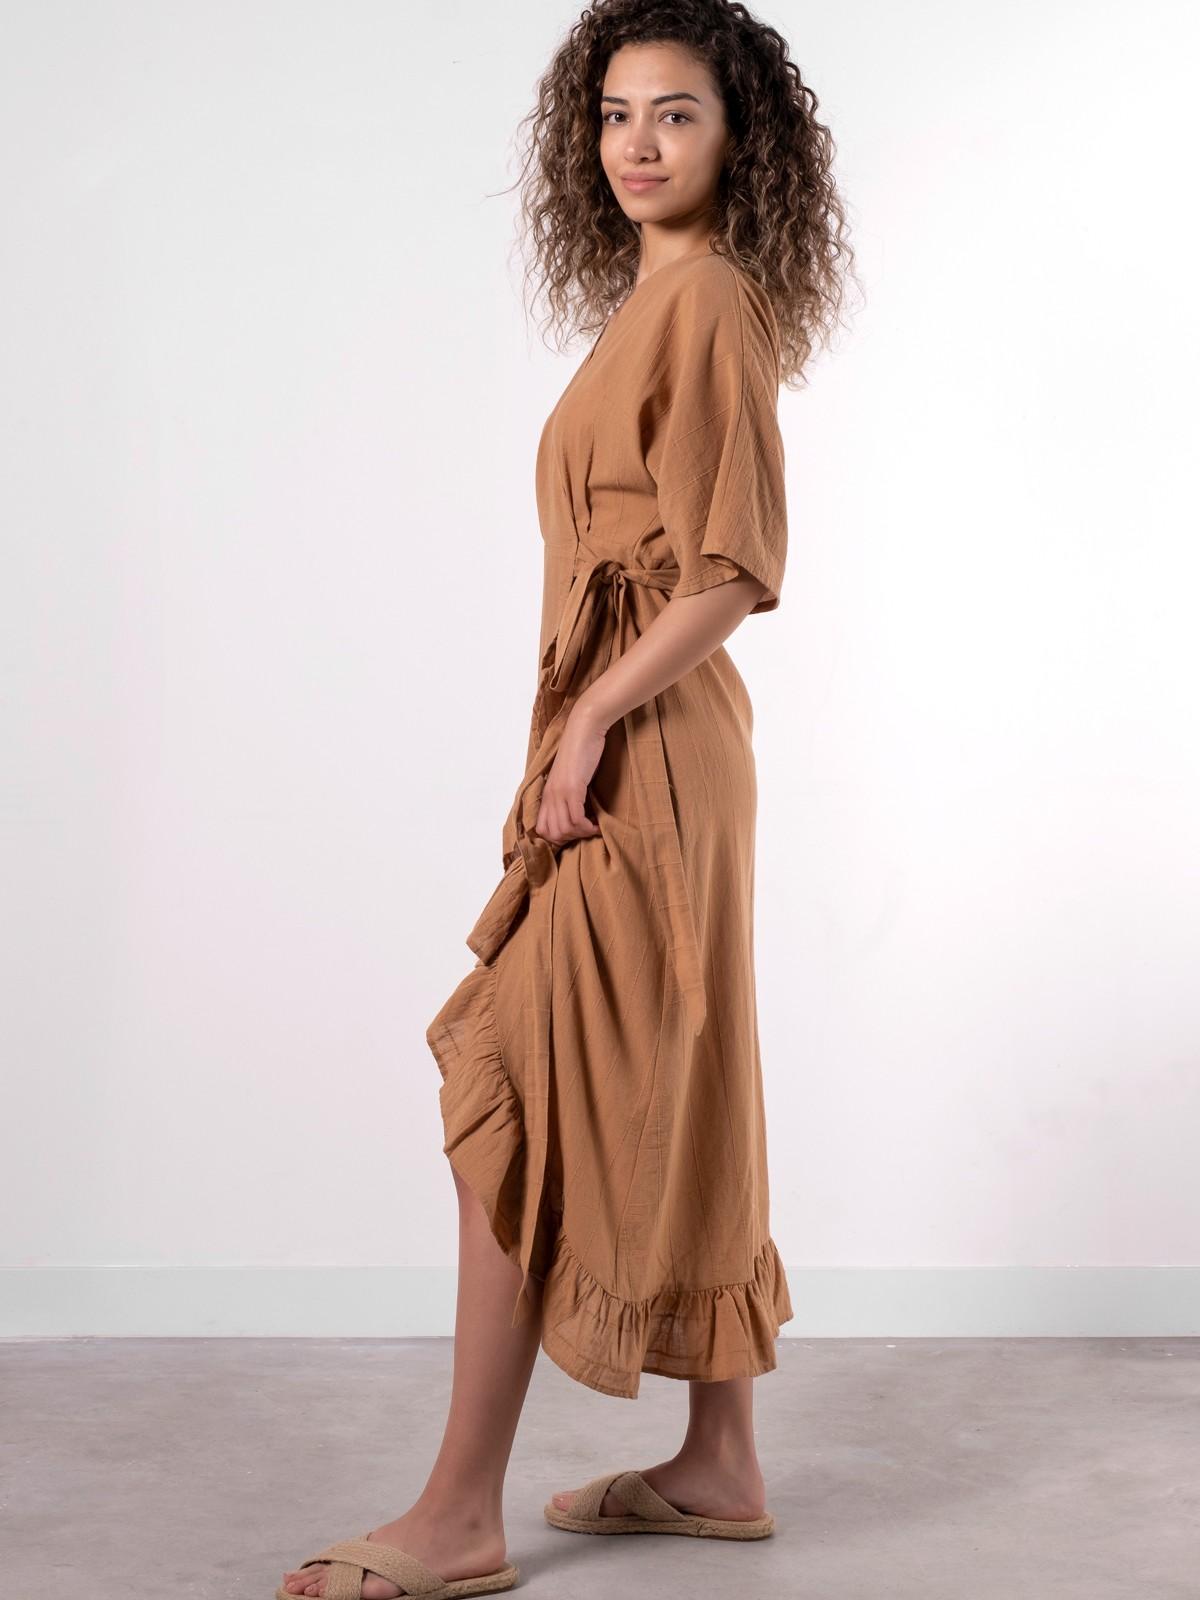 frilled-dress-indiantan3-1200x1600w